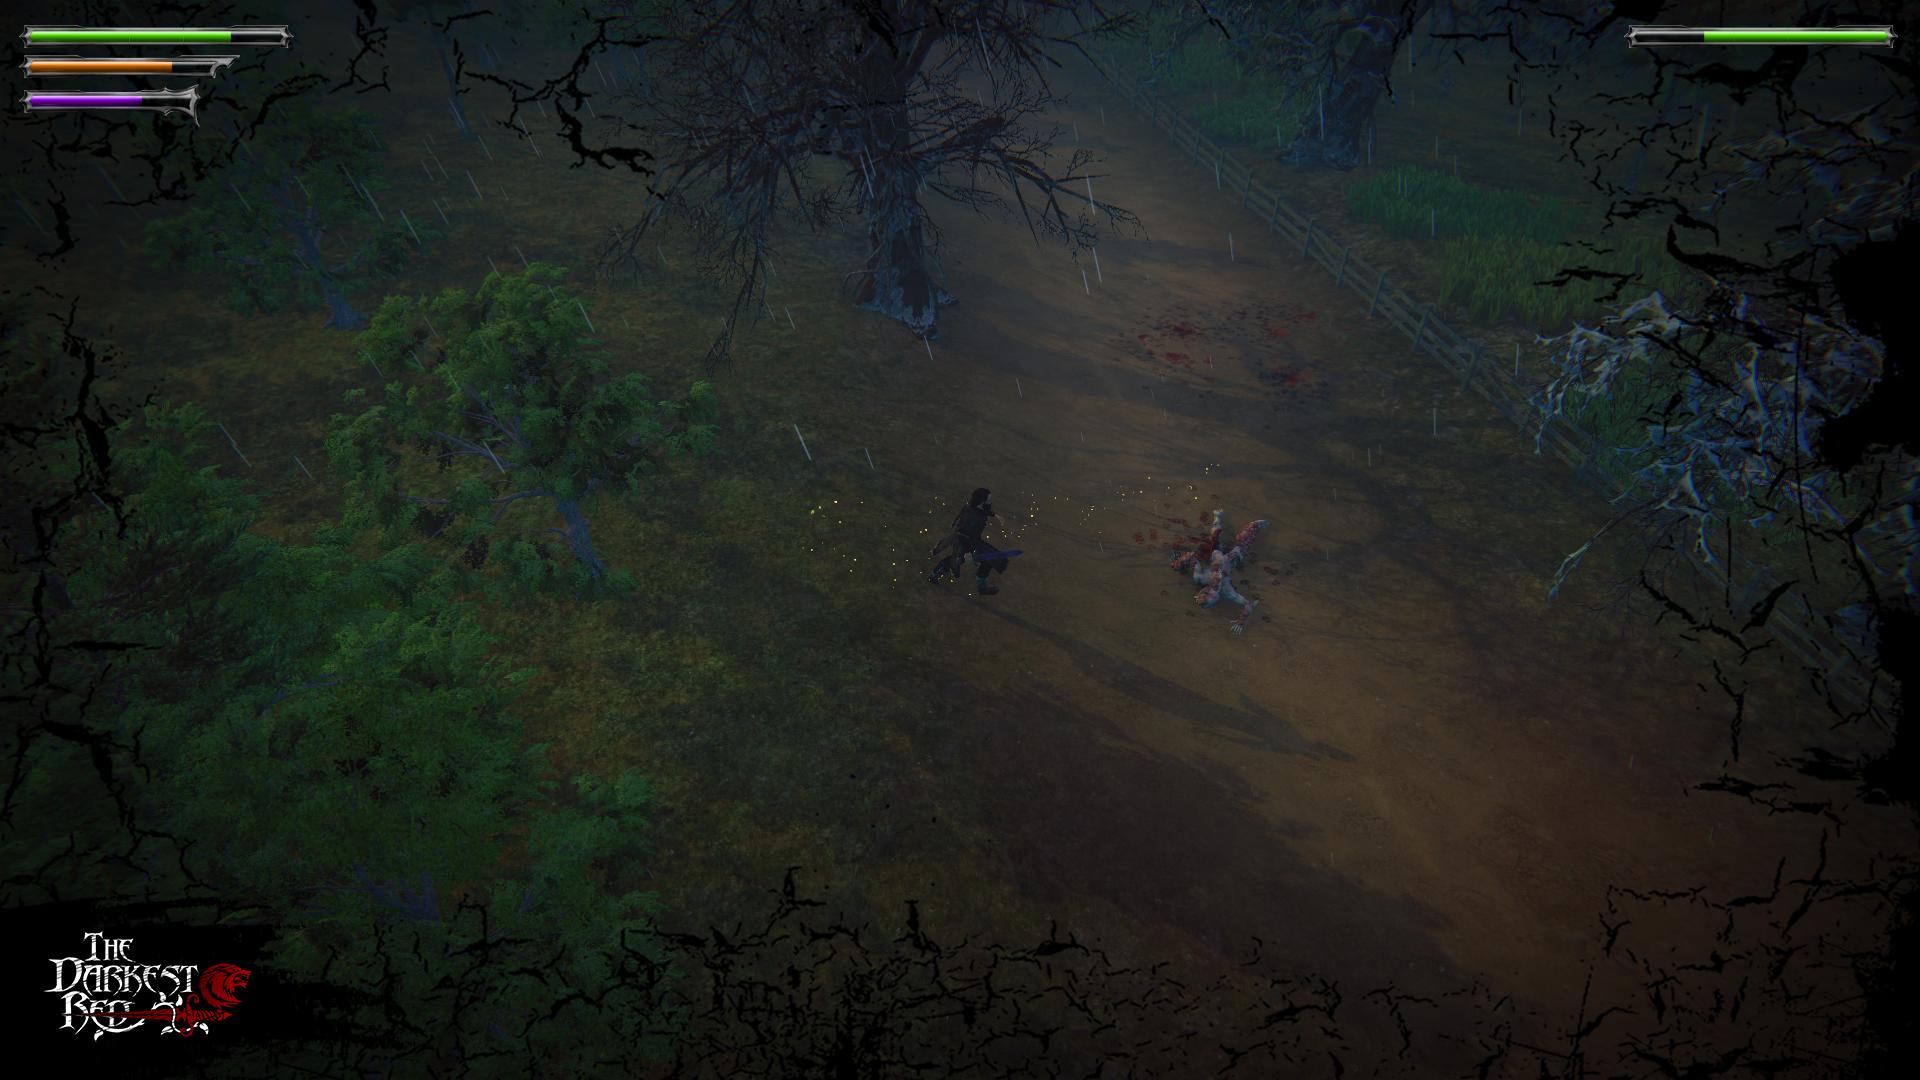 The Darkest Red dead monster screen